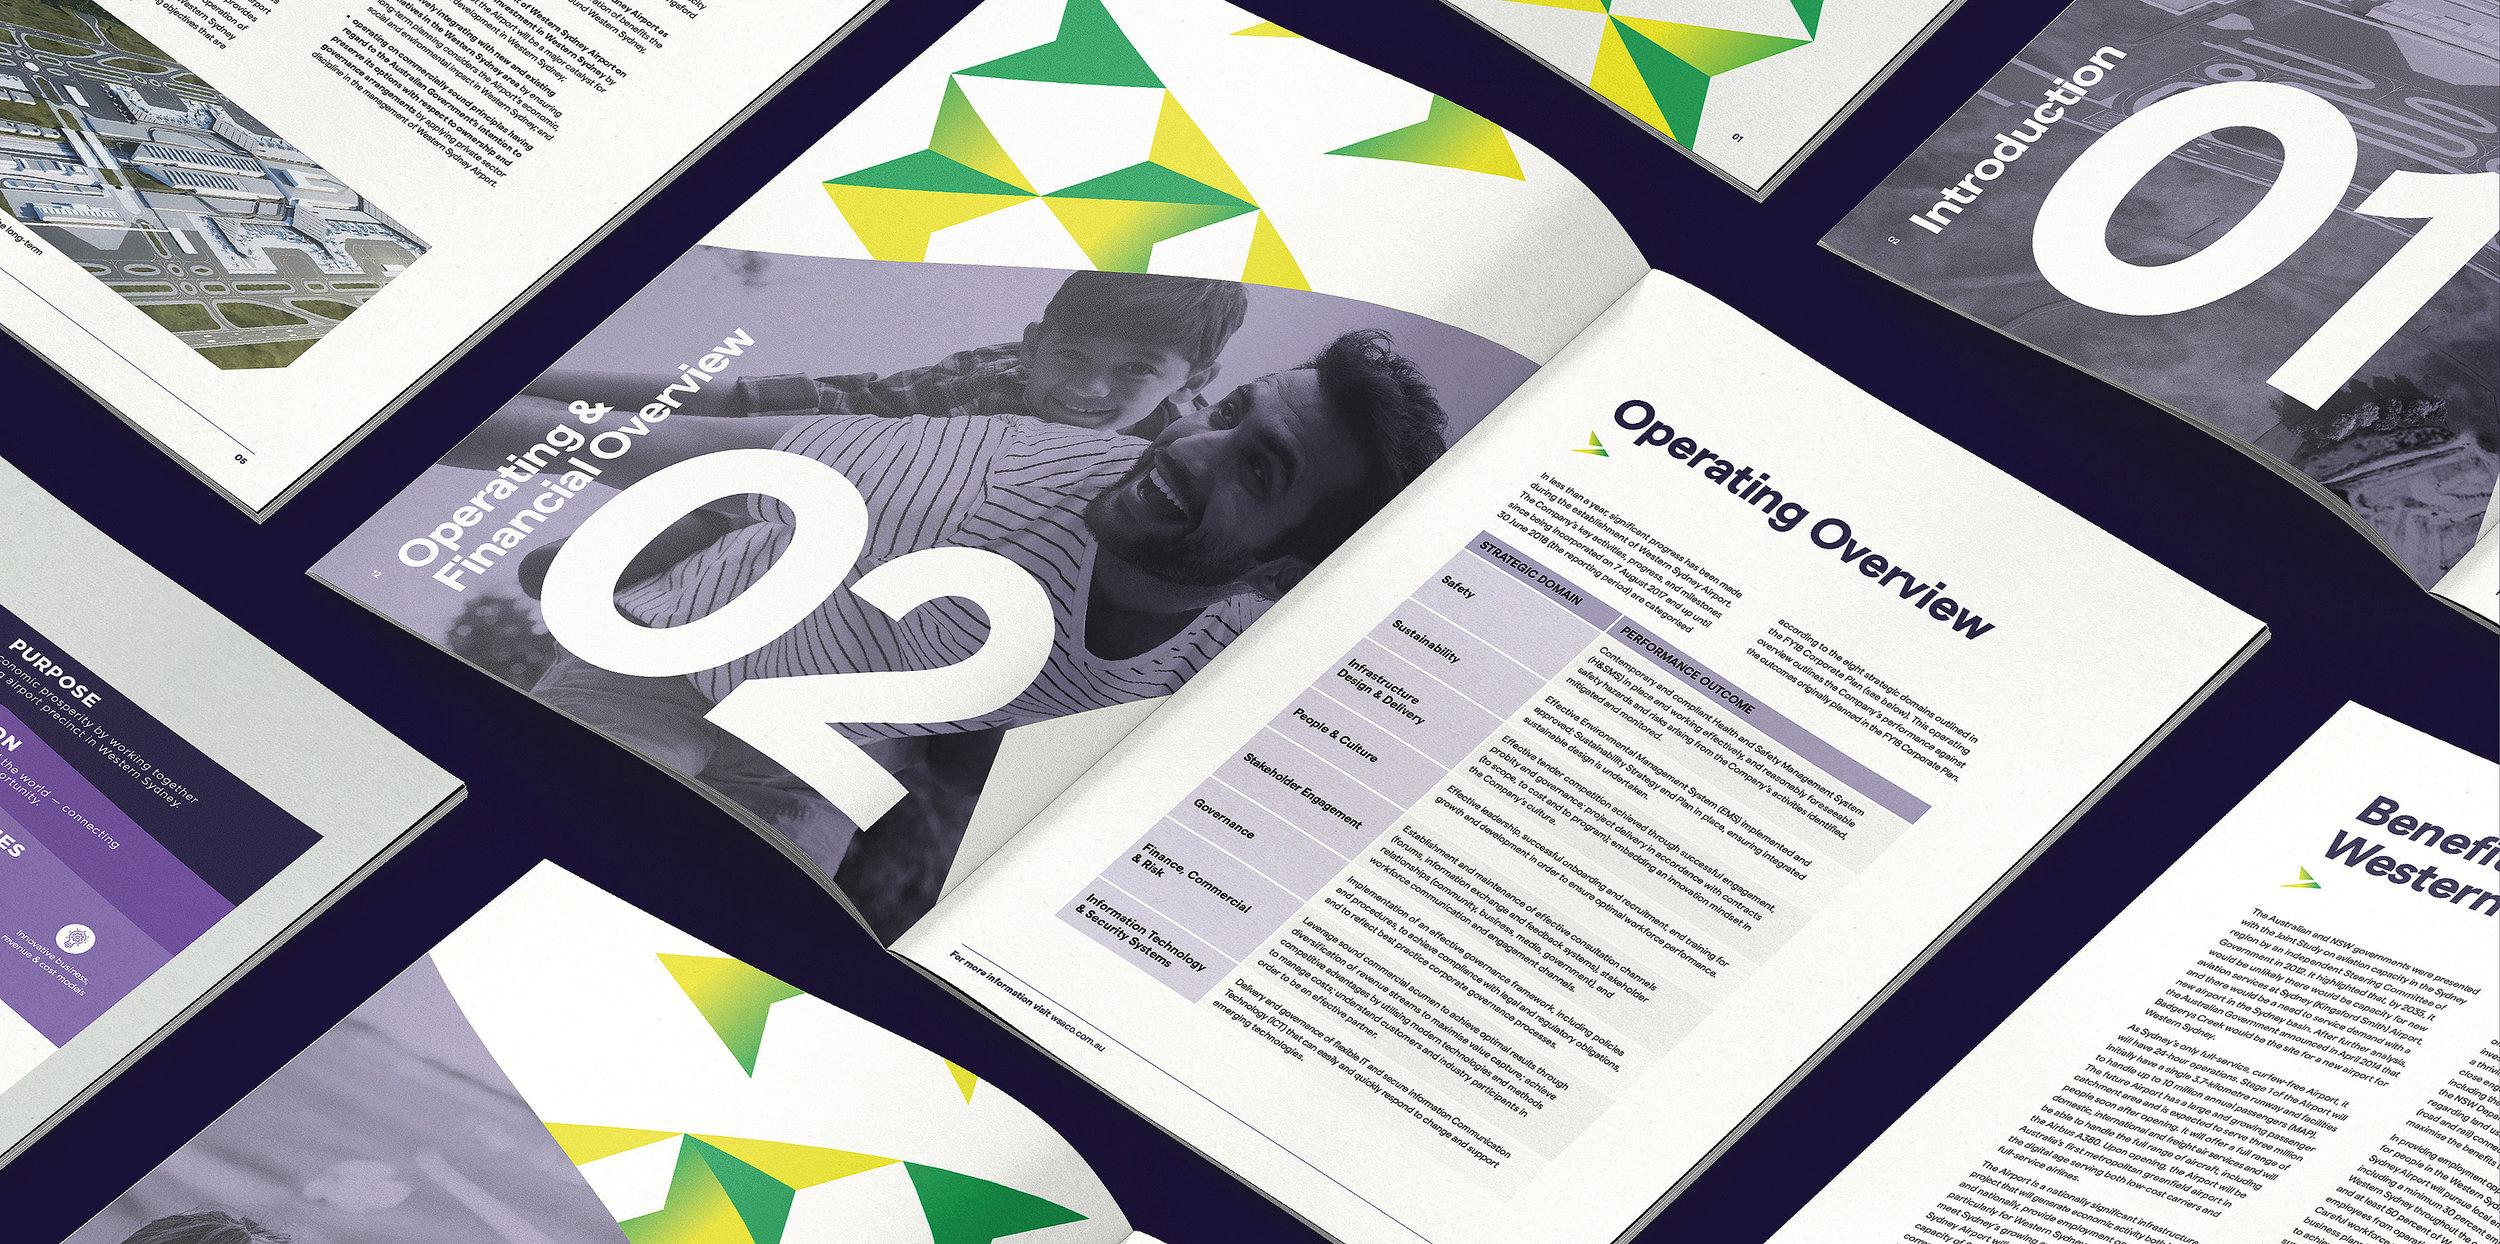 Western-Sydney-Airport-Annual-Report-Design-05.jpg